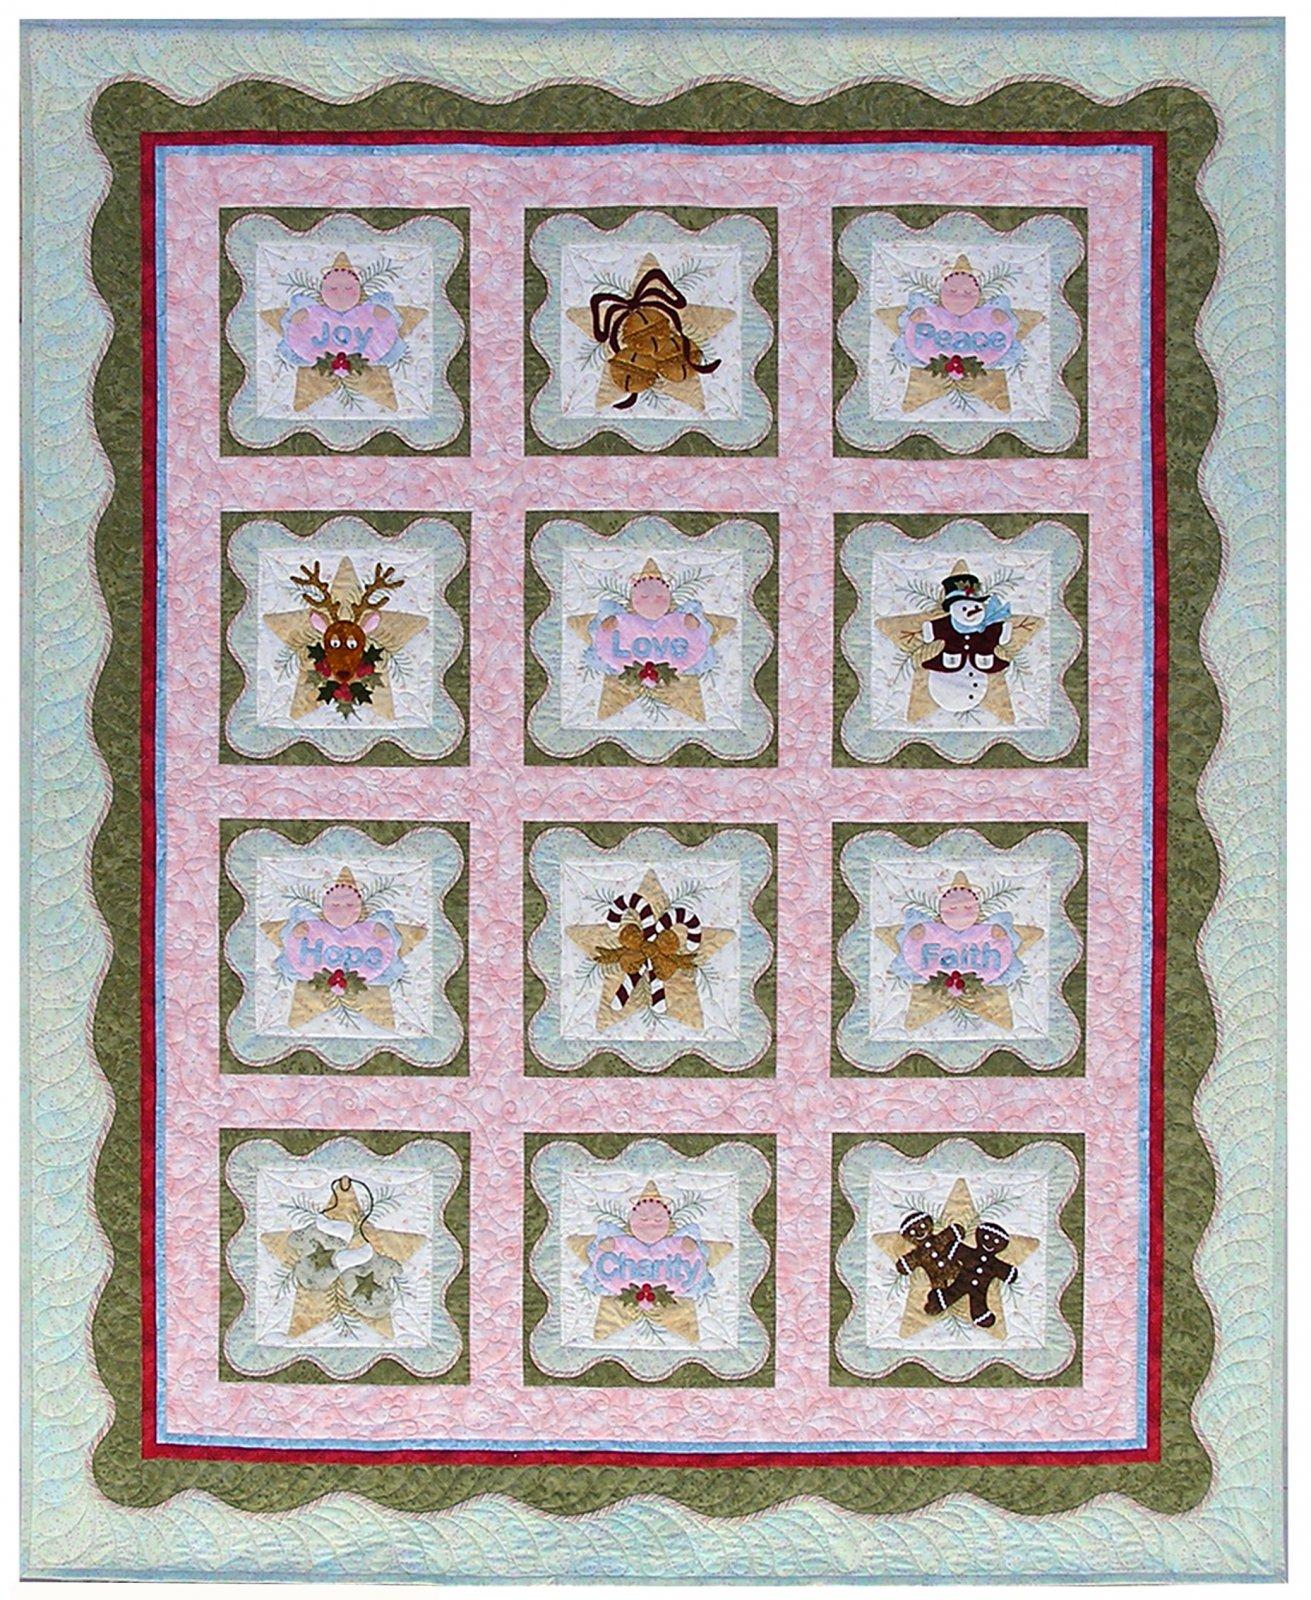 P3-1400 Anita's Christmas Quilt